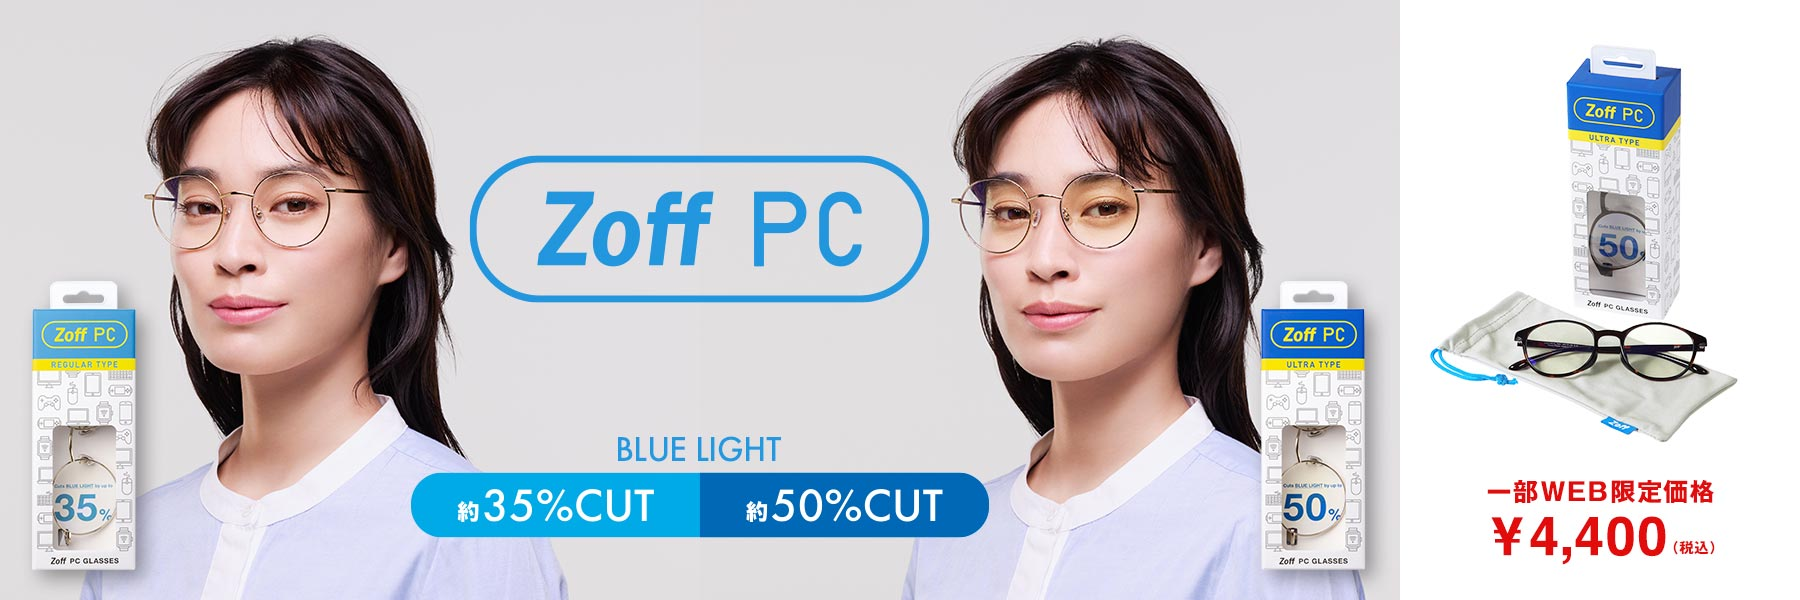 Zoff PC 一部WEB限定価格¥4,000(税別)